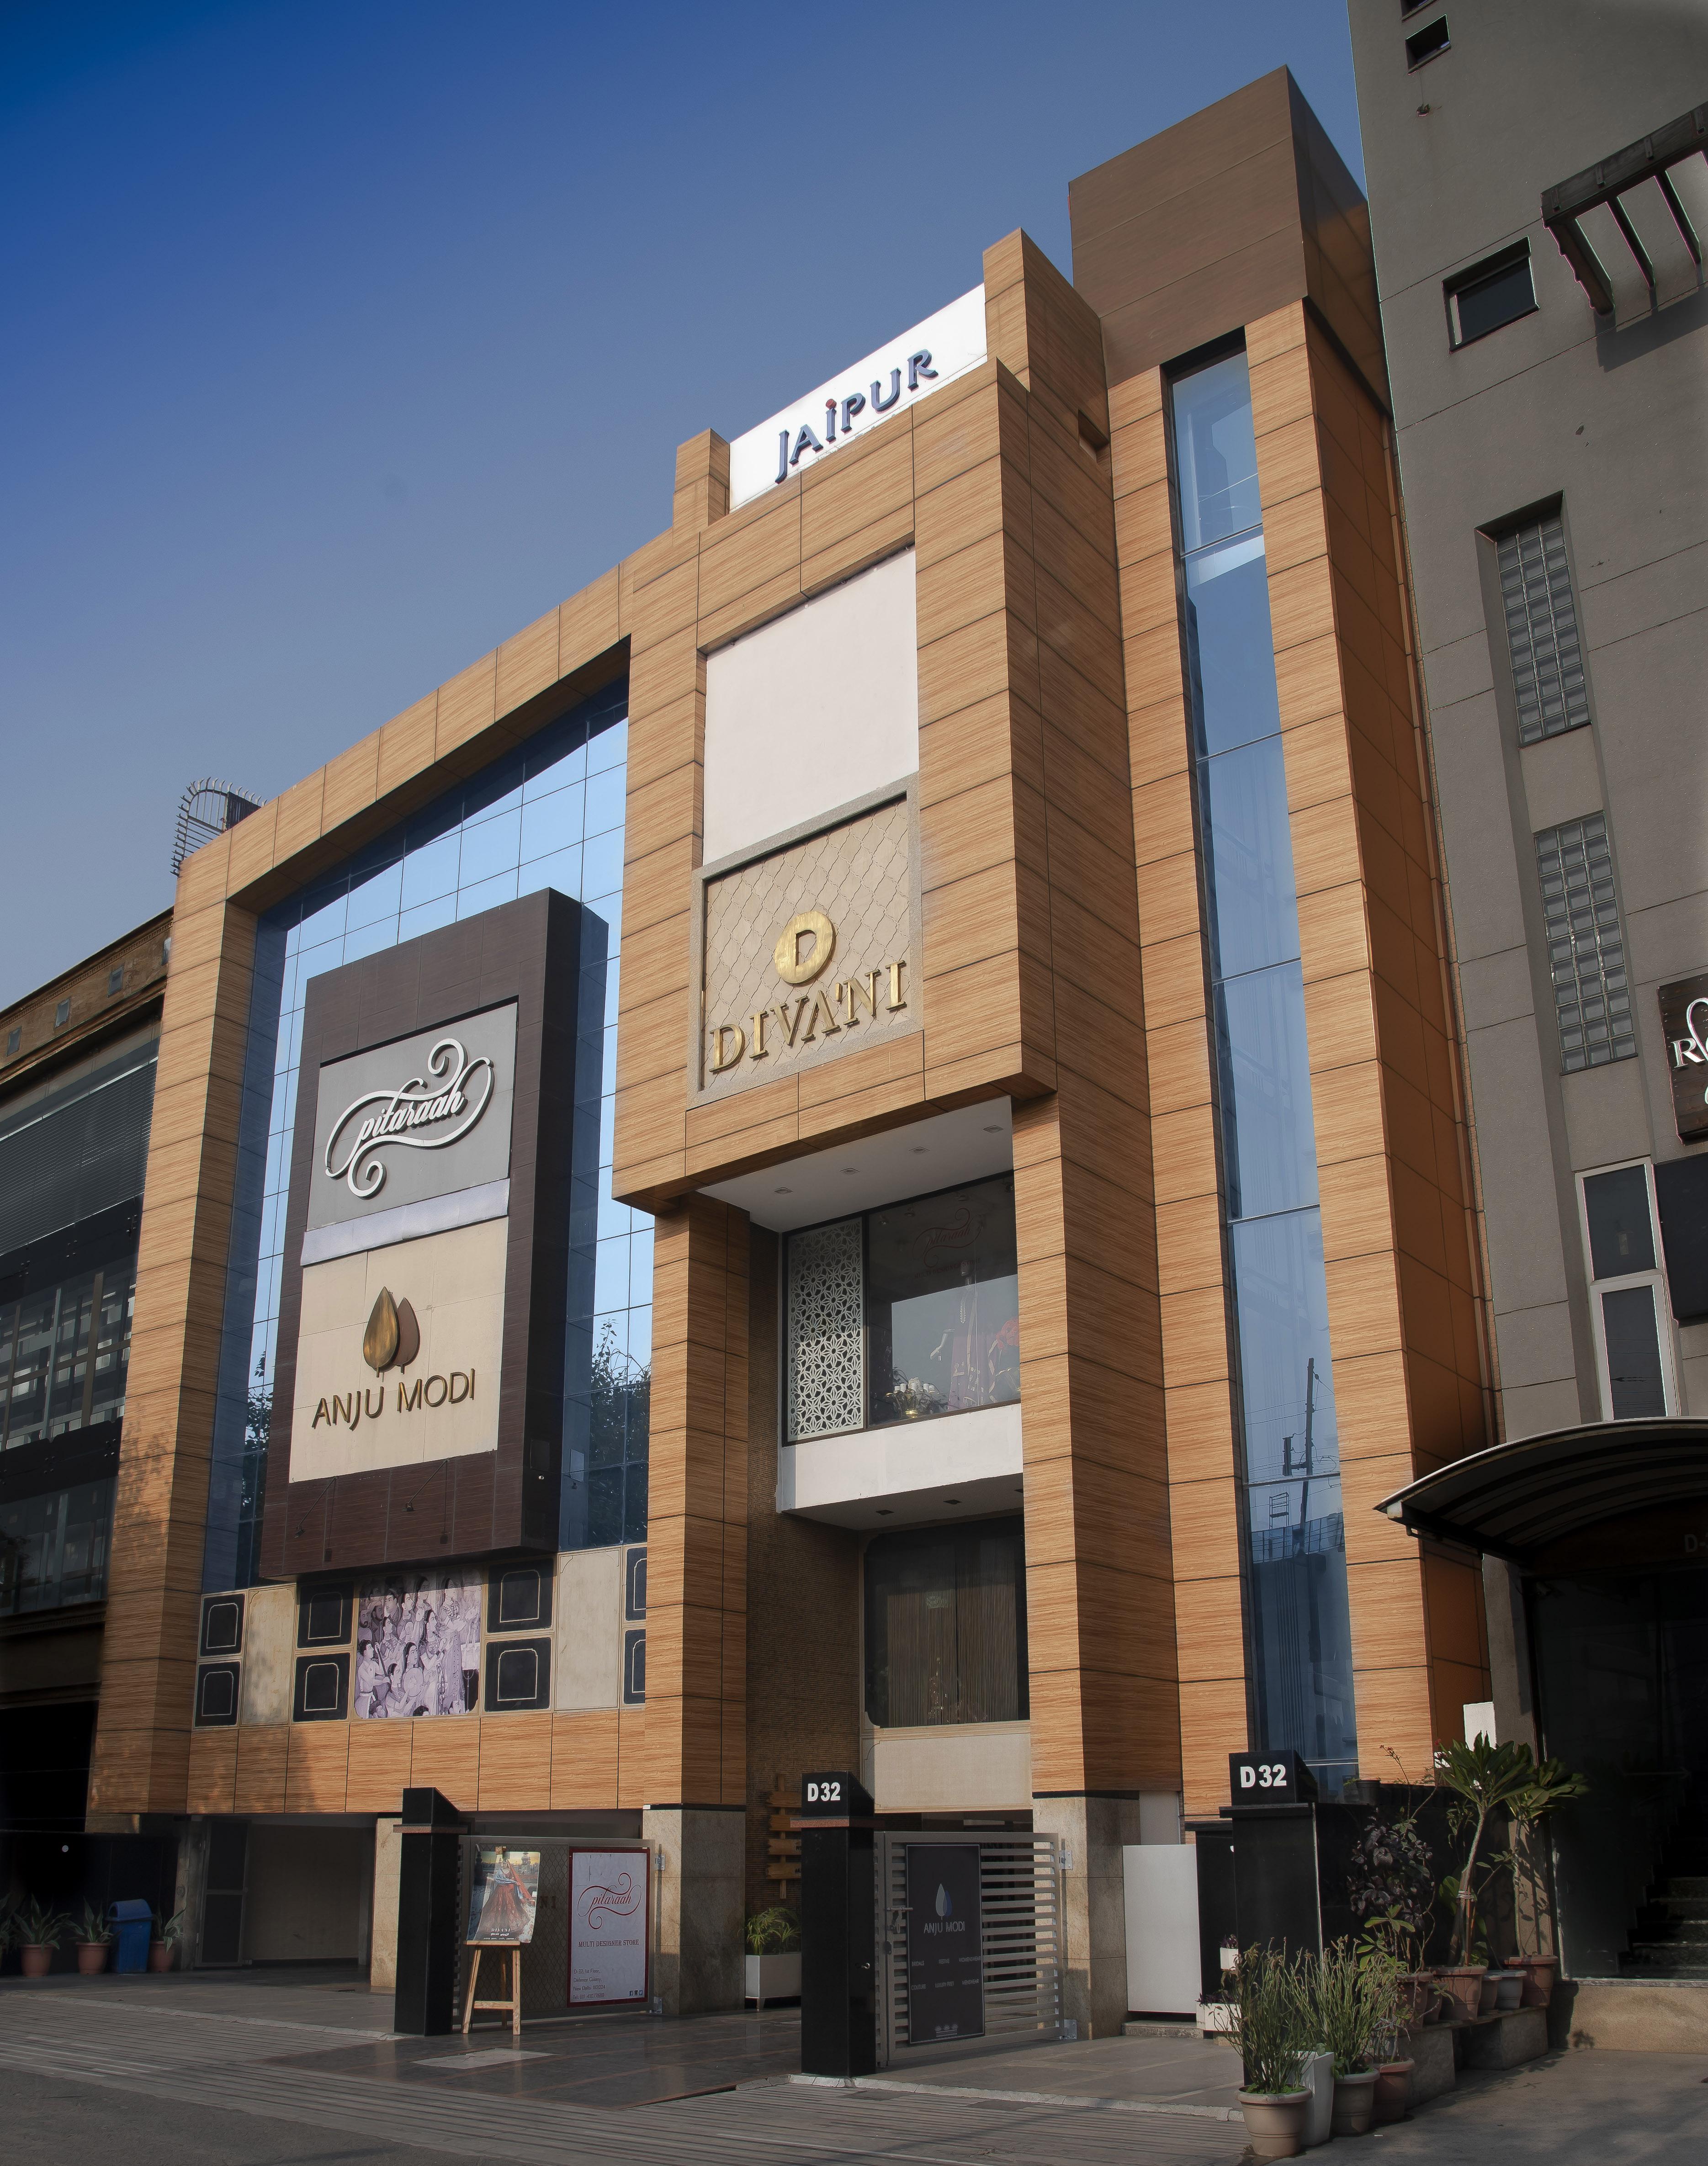 Jaipur Plaza Commercial Showroom